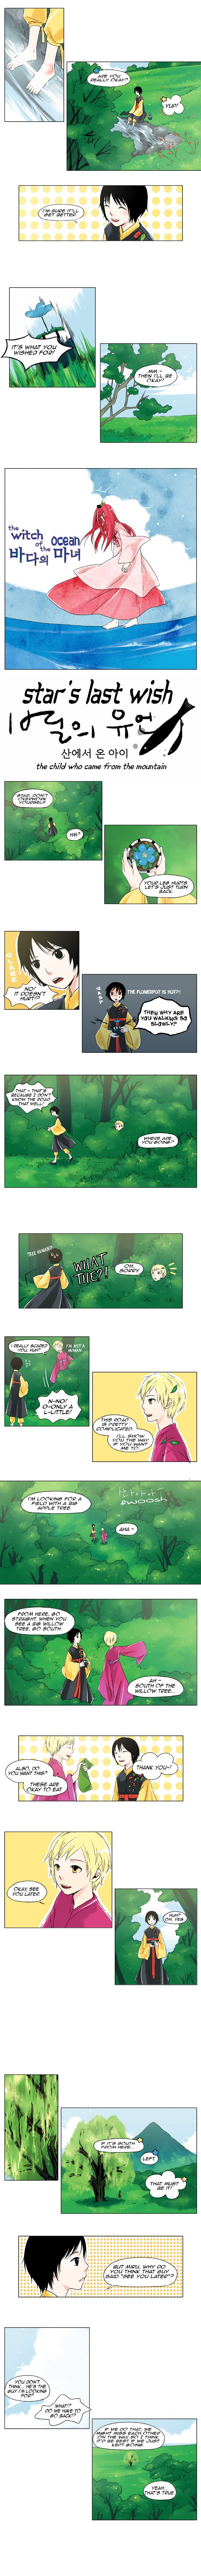 Star's Last Wish 3 Page 2